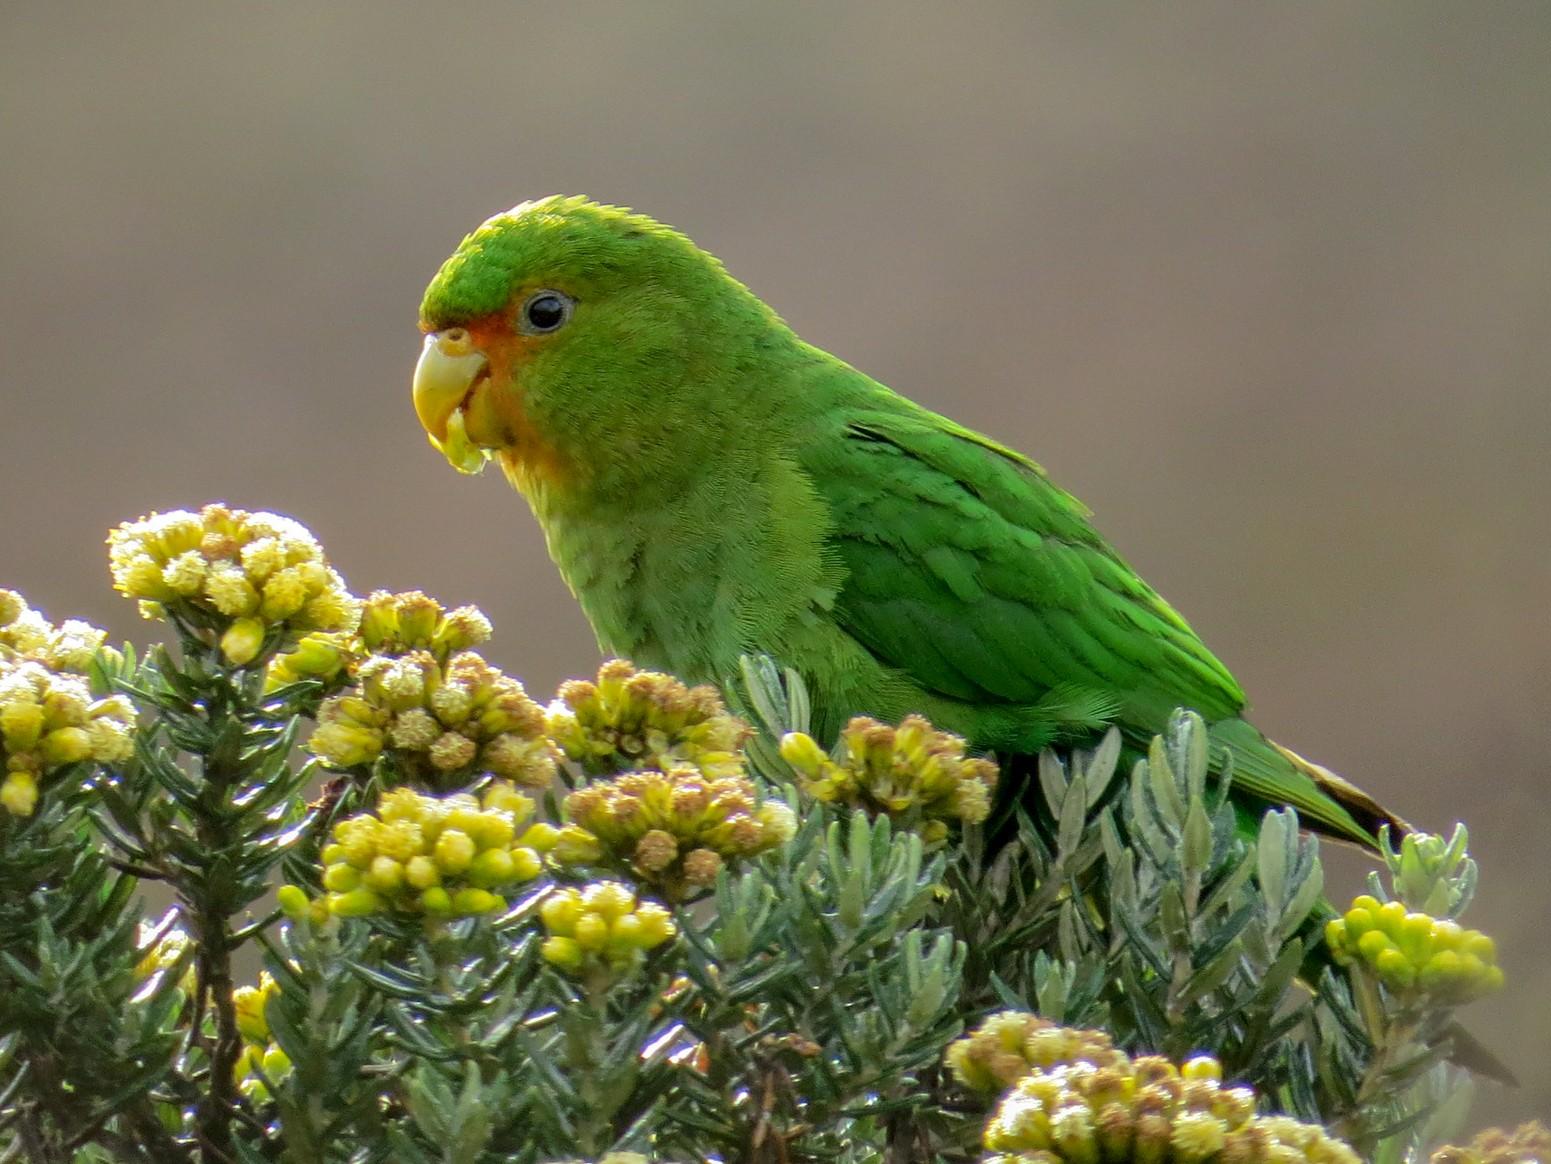 Rufous-fronted Parakeet - Juan carlos Hincapie consonni